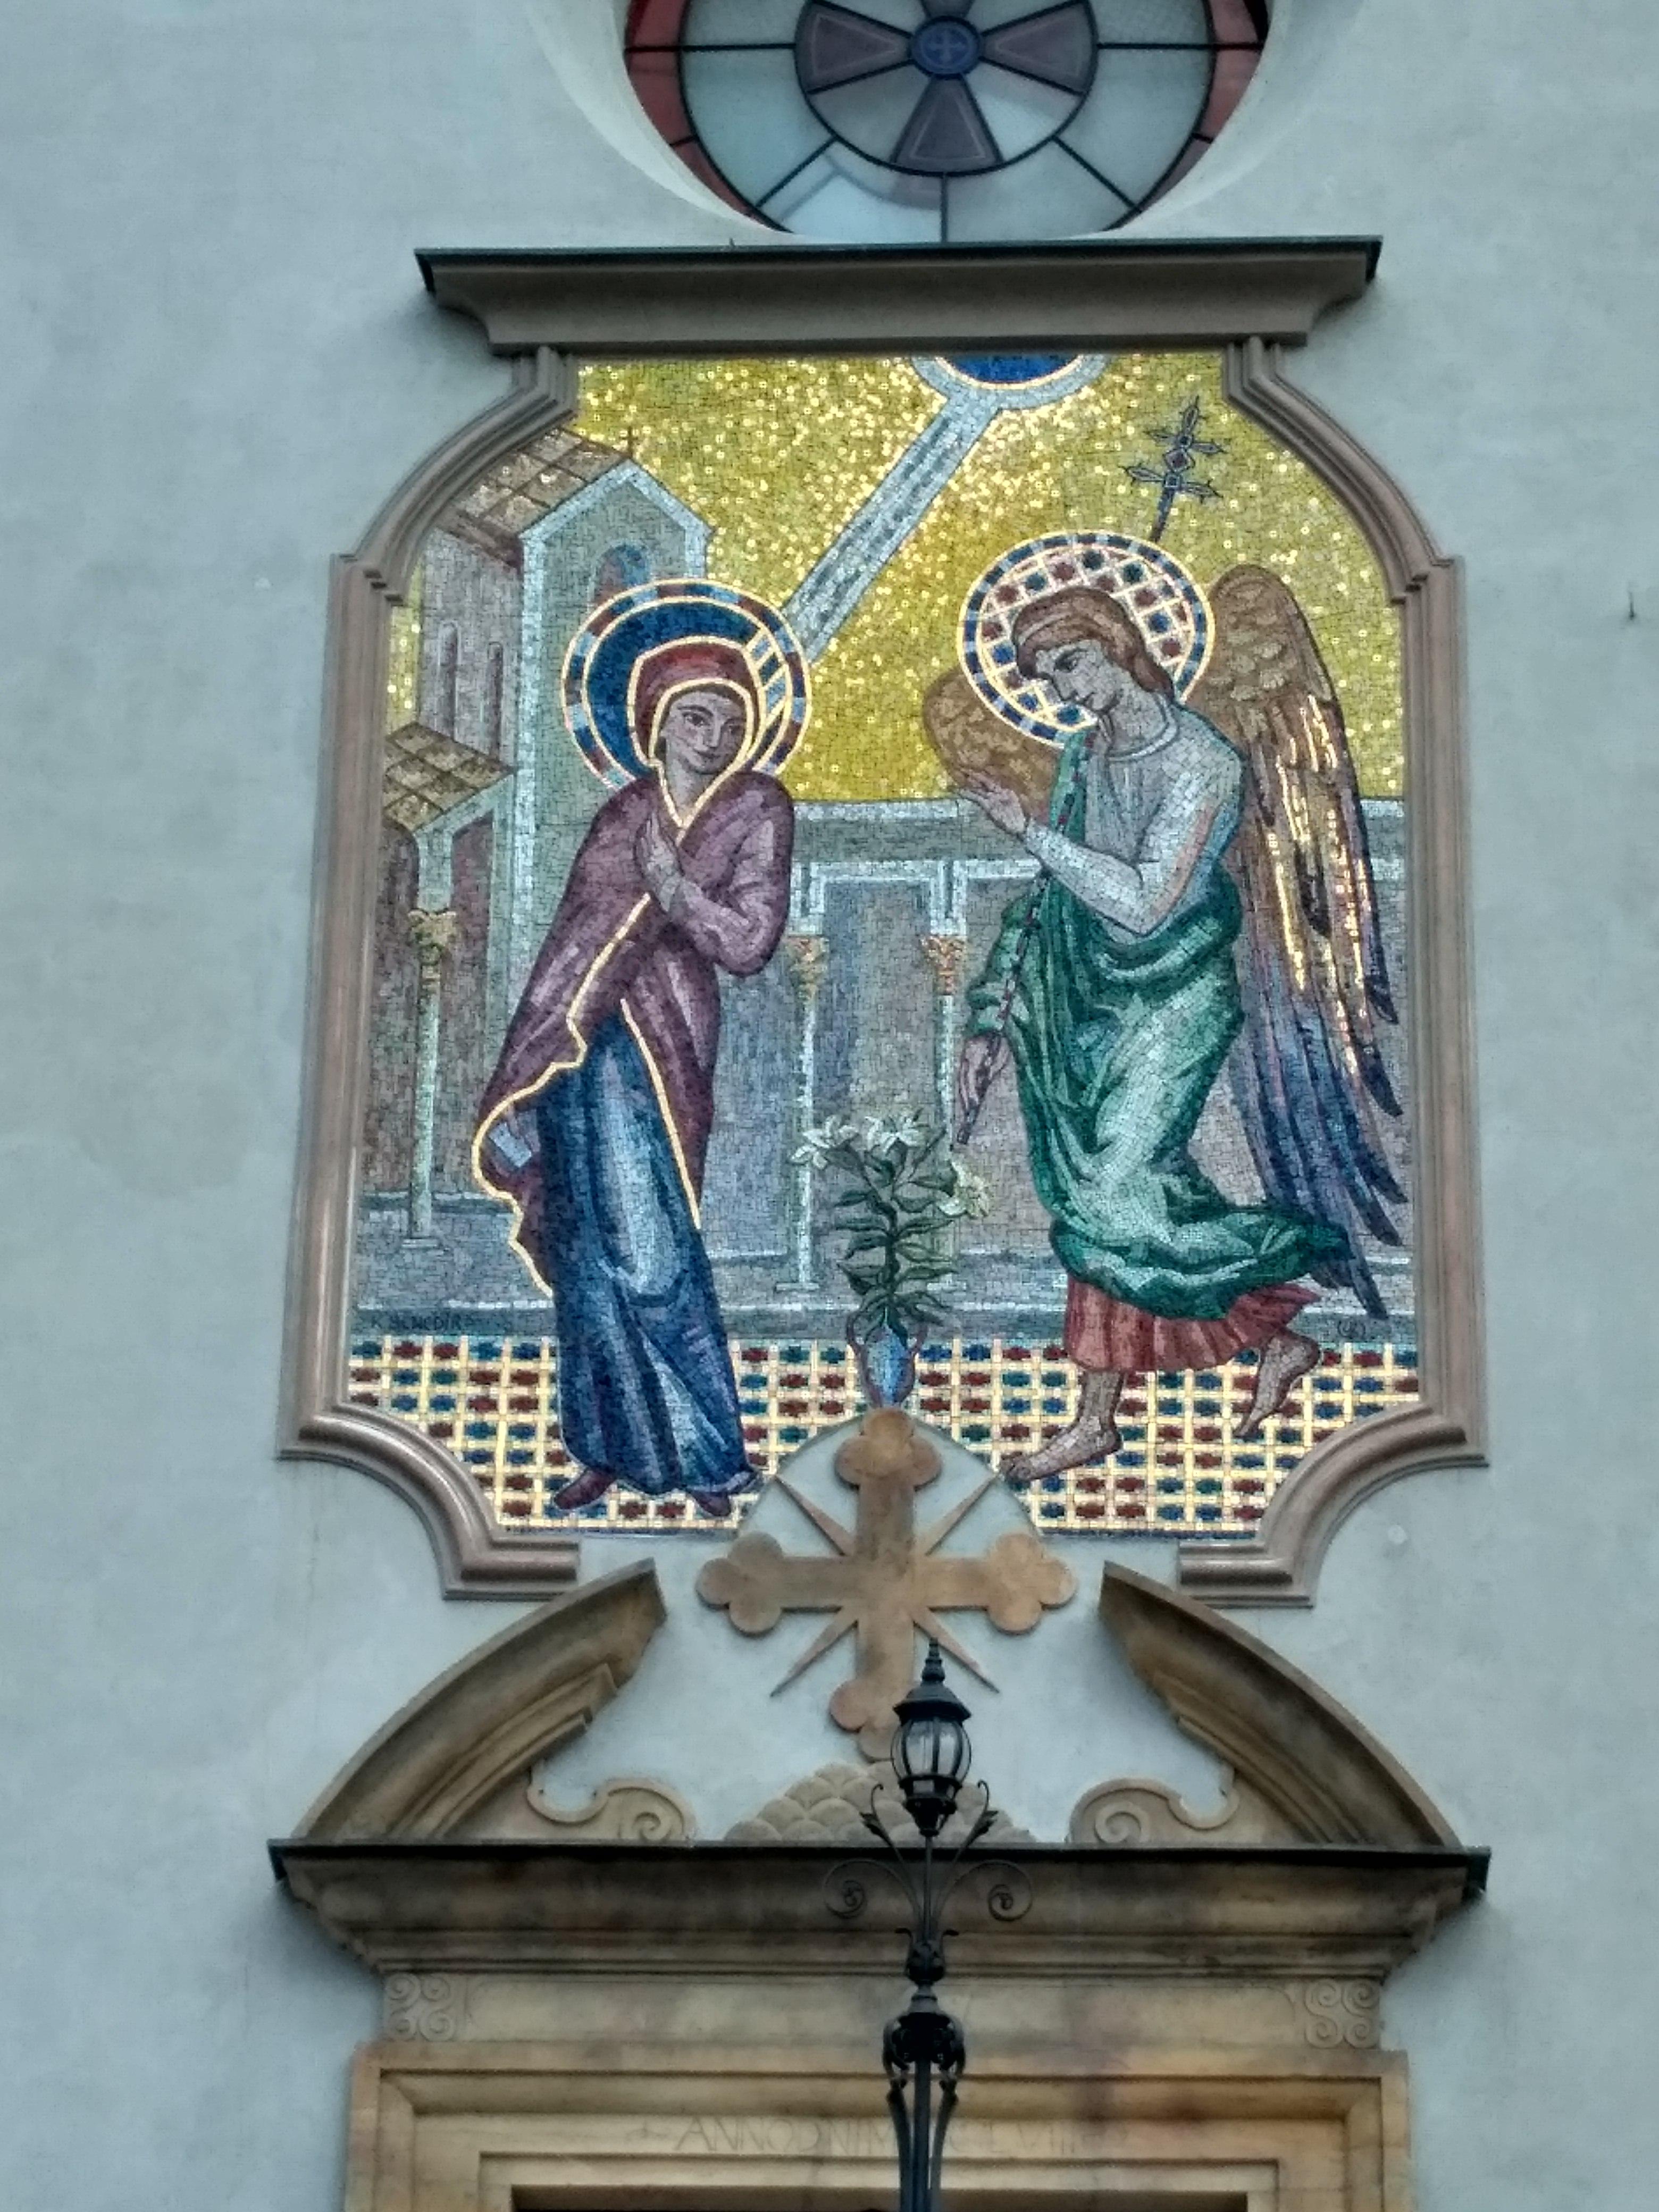 Soubor Mozaika Zvestovani Pane Olomouc Jpg Wikipedie